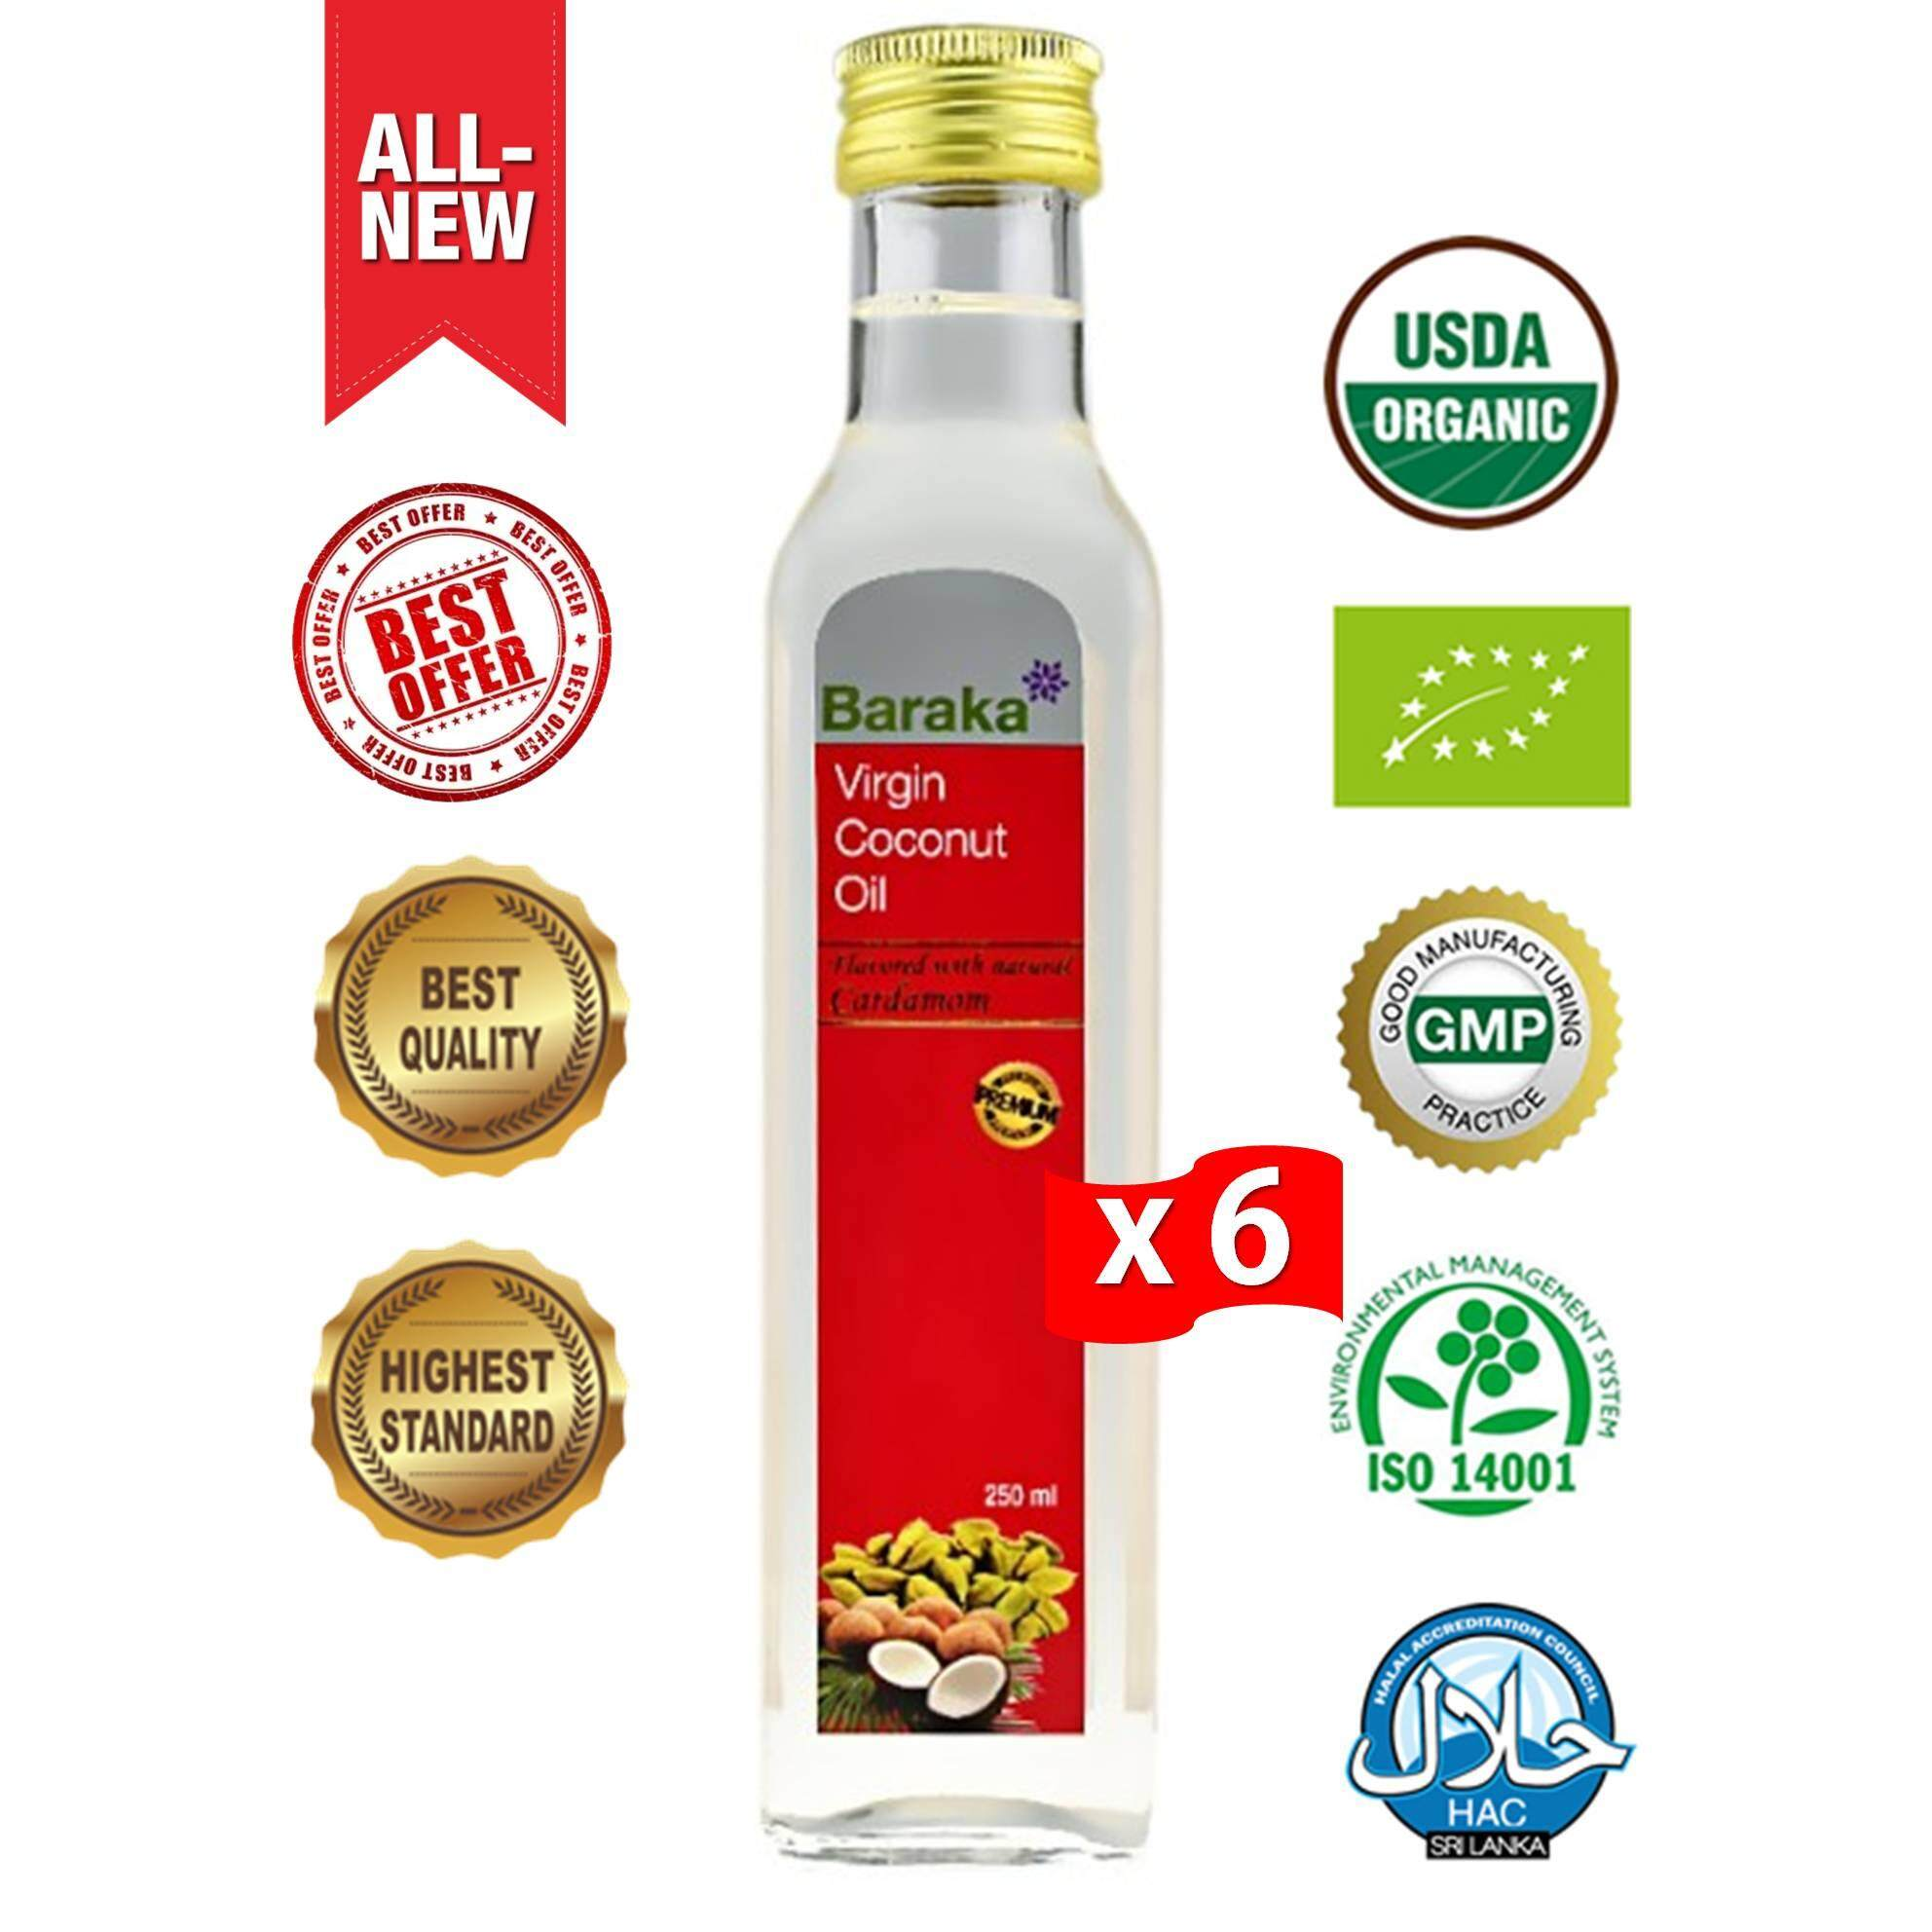 [BE$T Deal!] BARAKA Premium Virgin Coconut Oil, Flavored with Natural Cardamom, 250ml - 6 Bottles